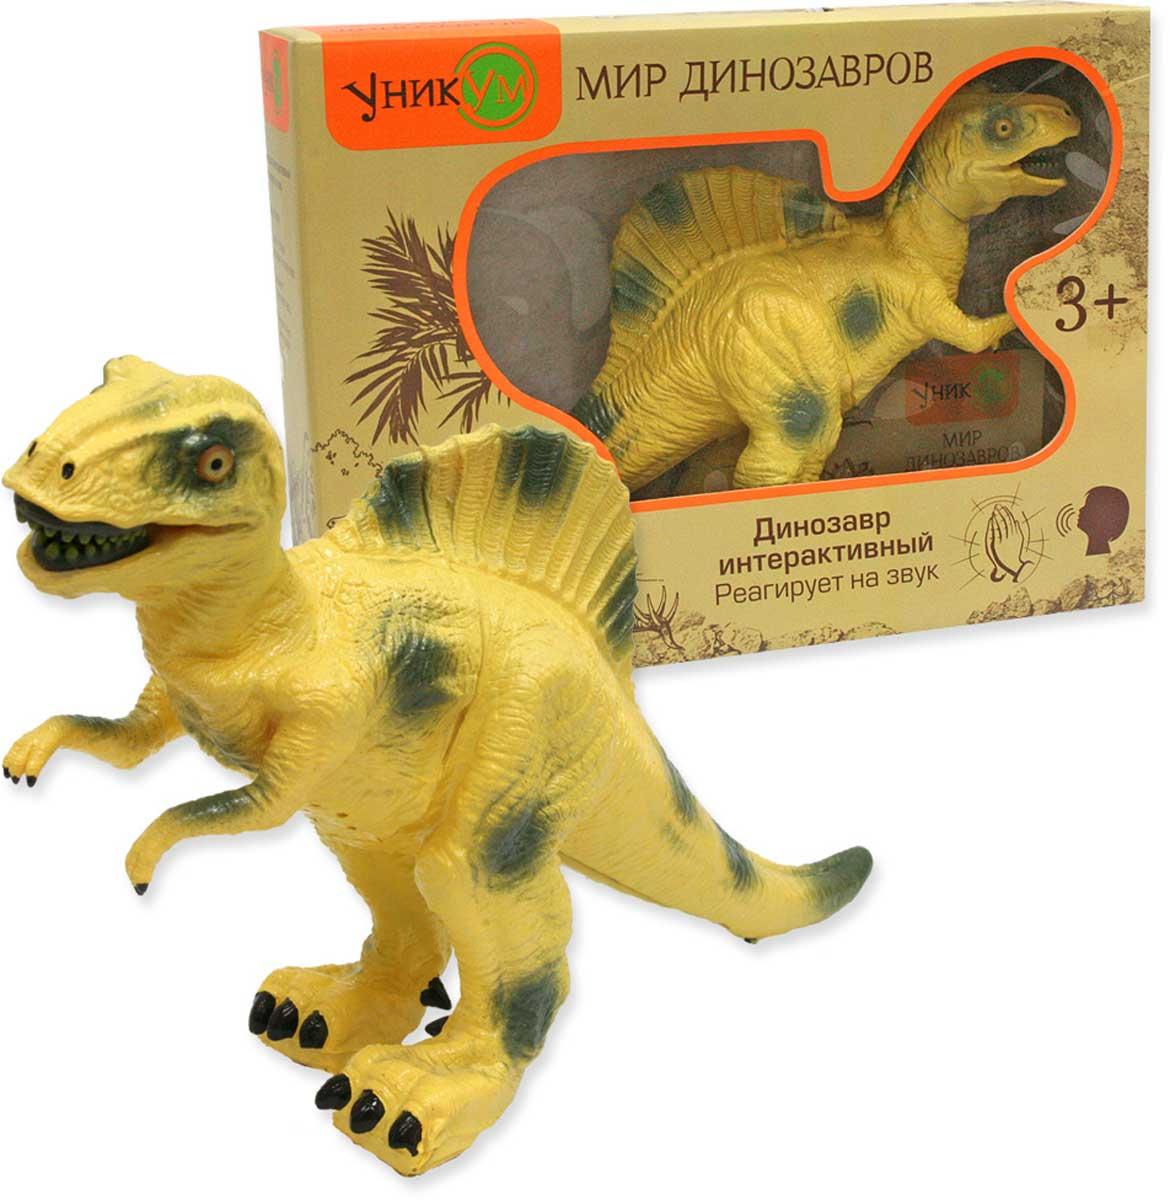 Ami&Co Интерактивная игрушка Динозавр Спинозавр - Интерактивные игрушки